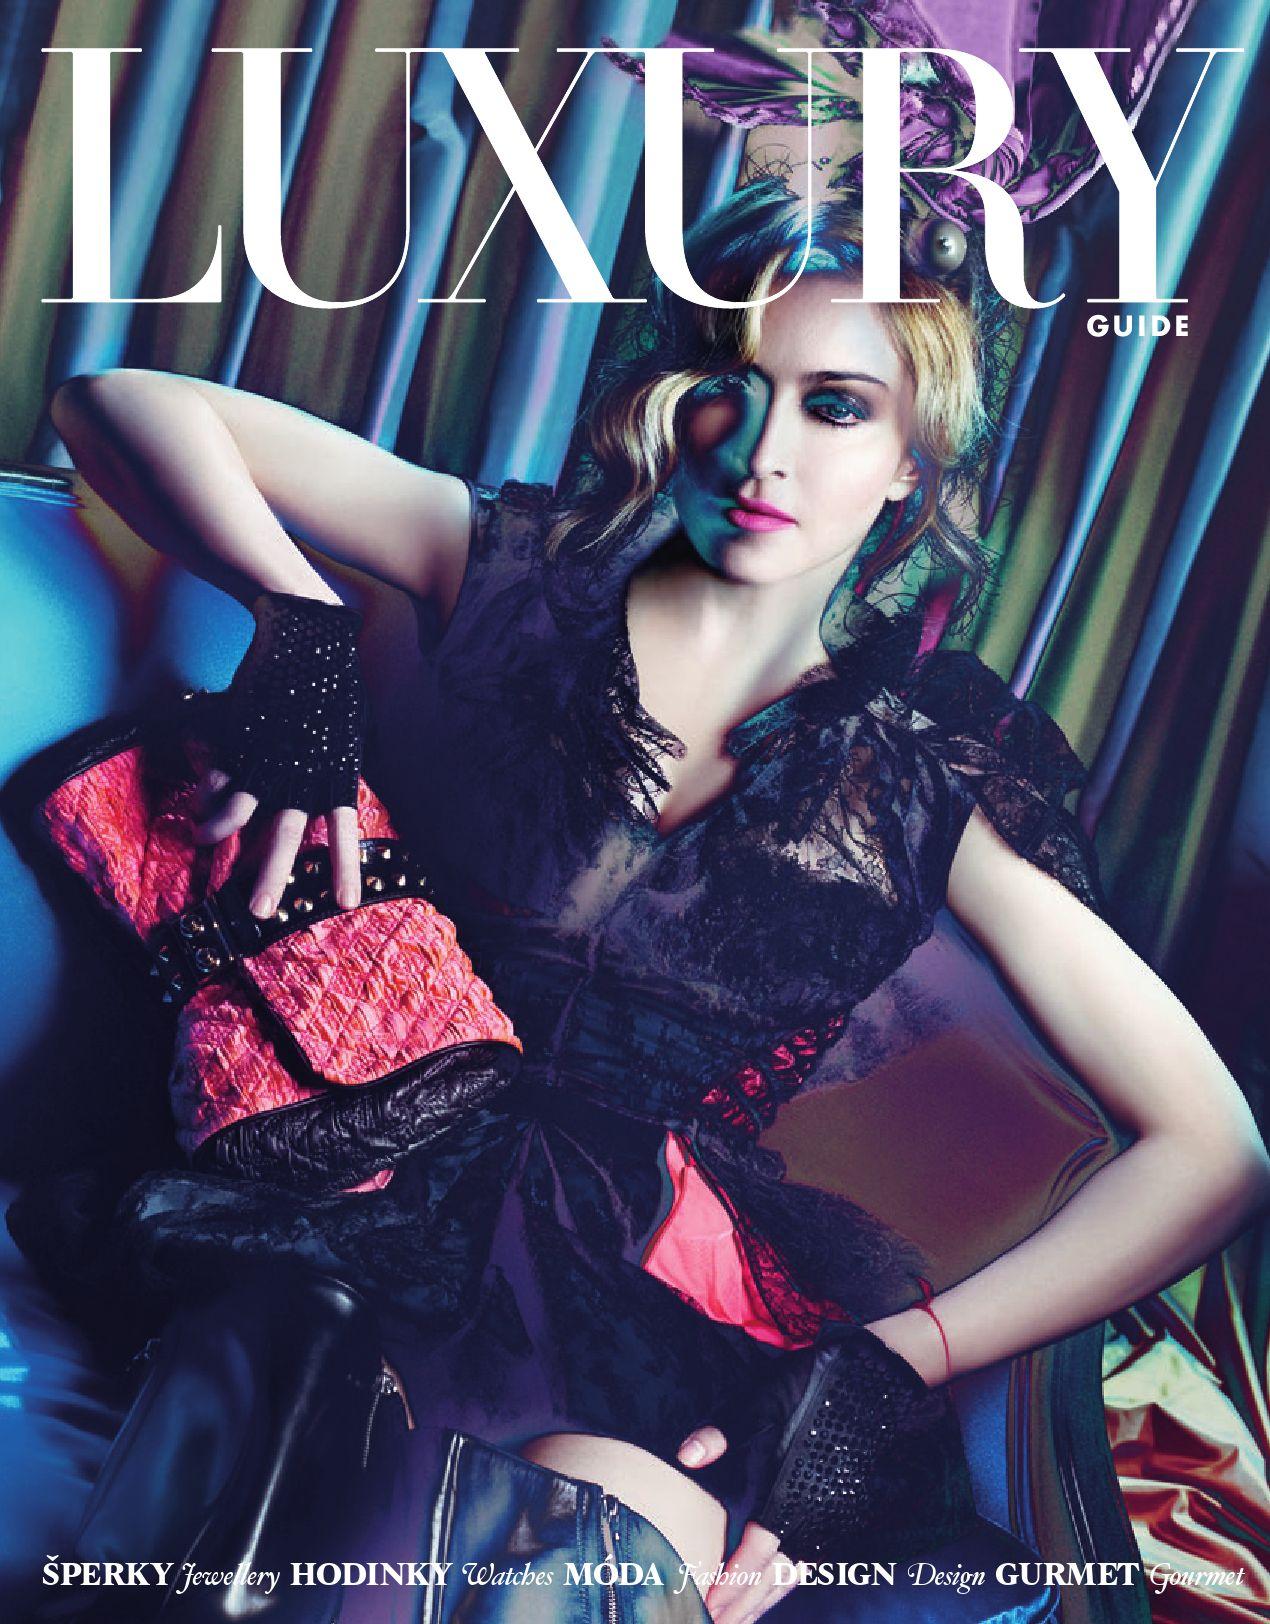 c04c3dc48e20 luxury guide by Bohdana Leeder - issuu